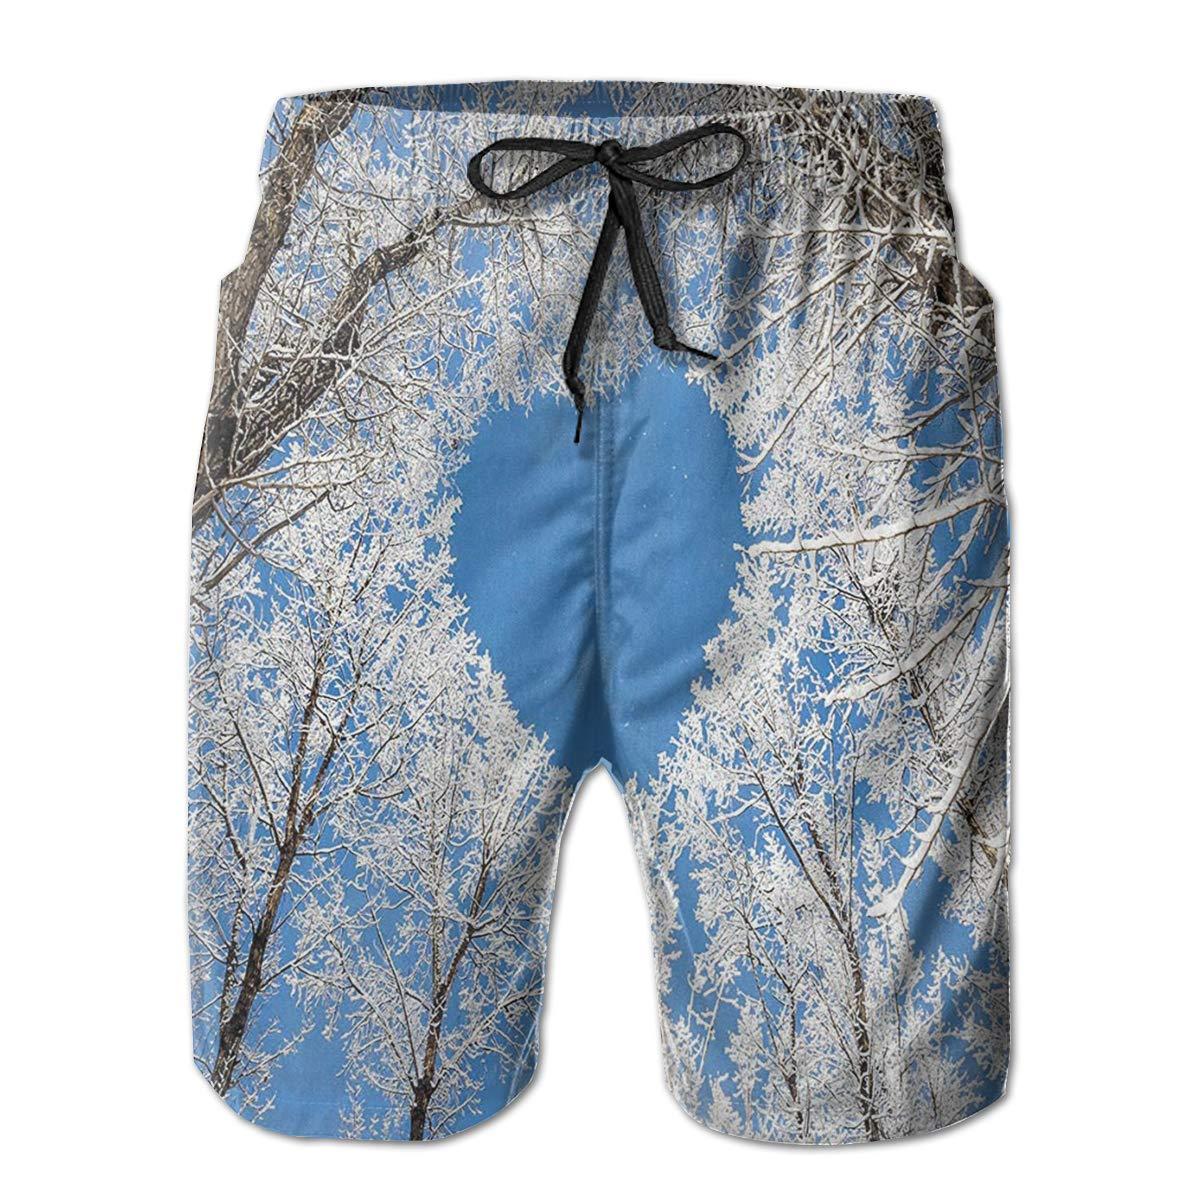 Bilybily Heart Shaped Branches Mens Swim Trunks Quick Dry Board Shorts with Pockets Summer Beach Shorts